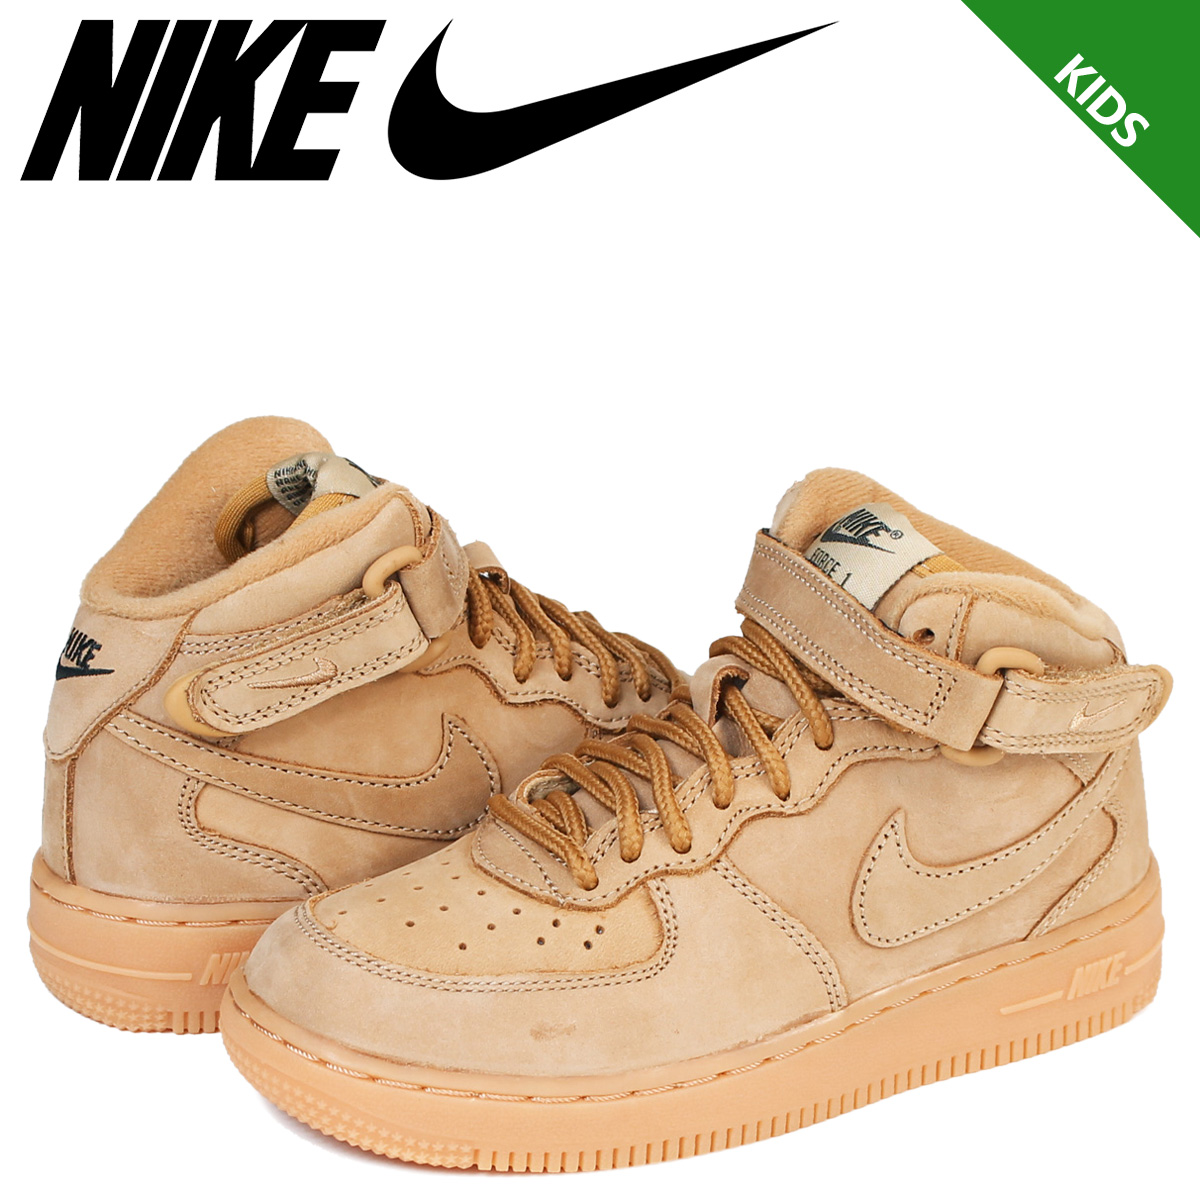 half off 849f8 f7929 NIKE AIR FORCE 1 WB PS Nike air force 1 mid kids sneakers AH0756-203 shoes  brown 928 Shinnyu load